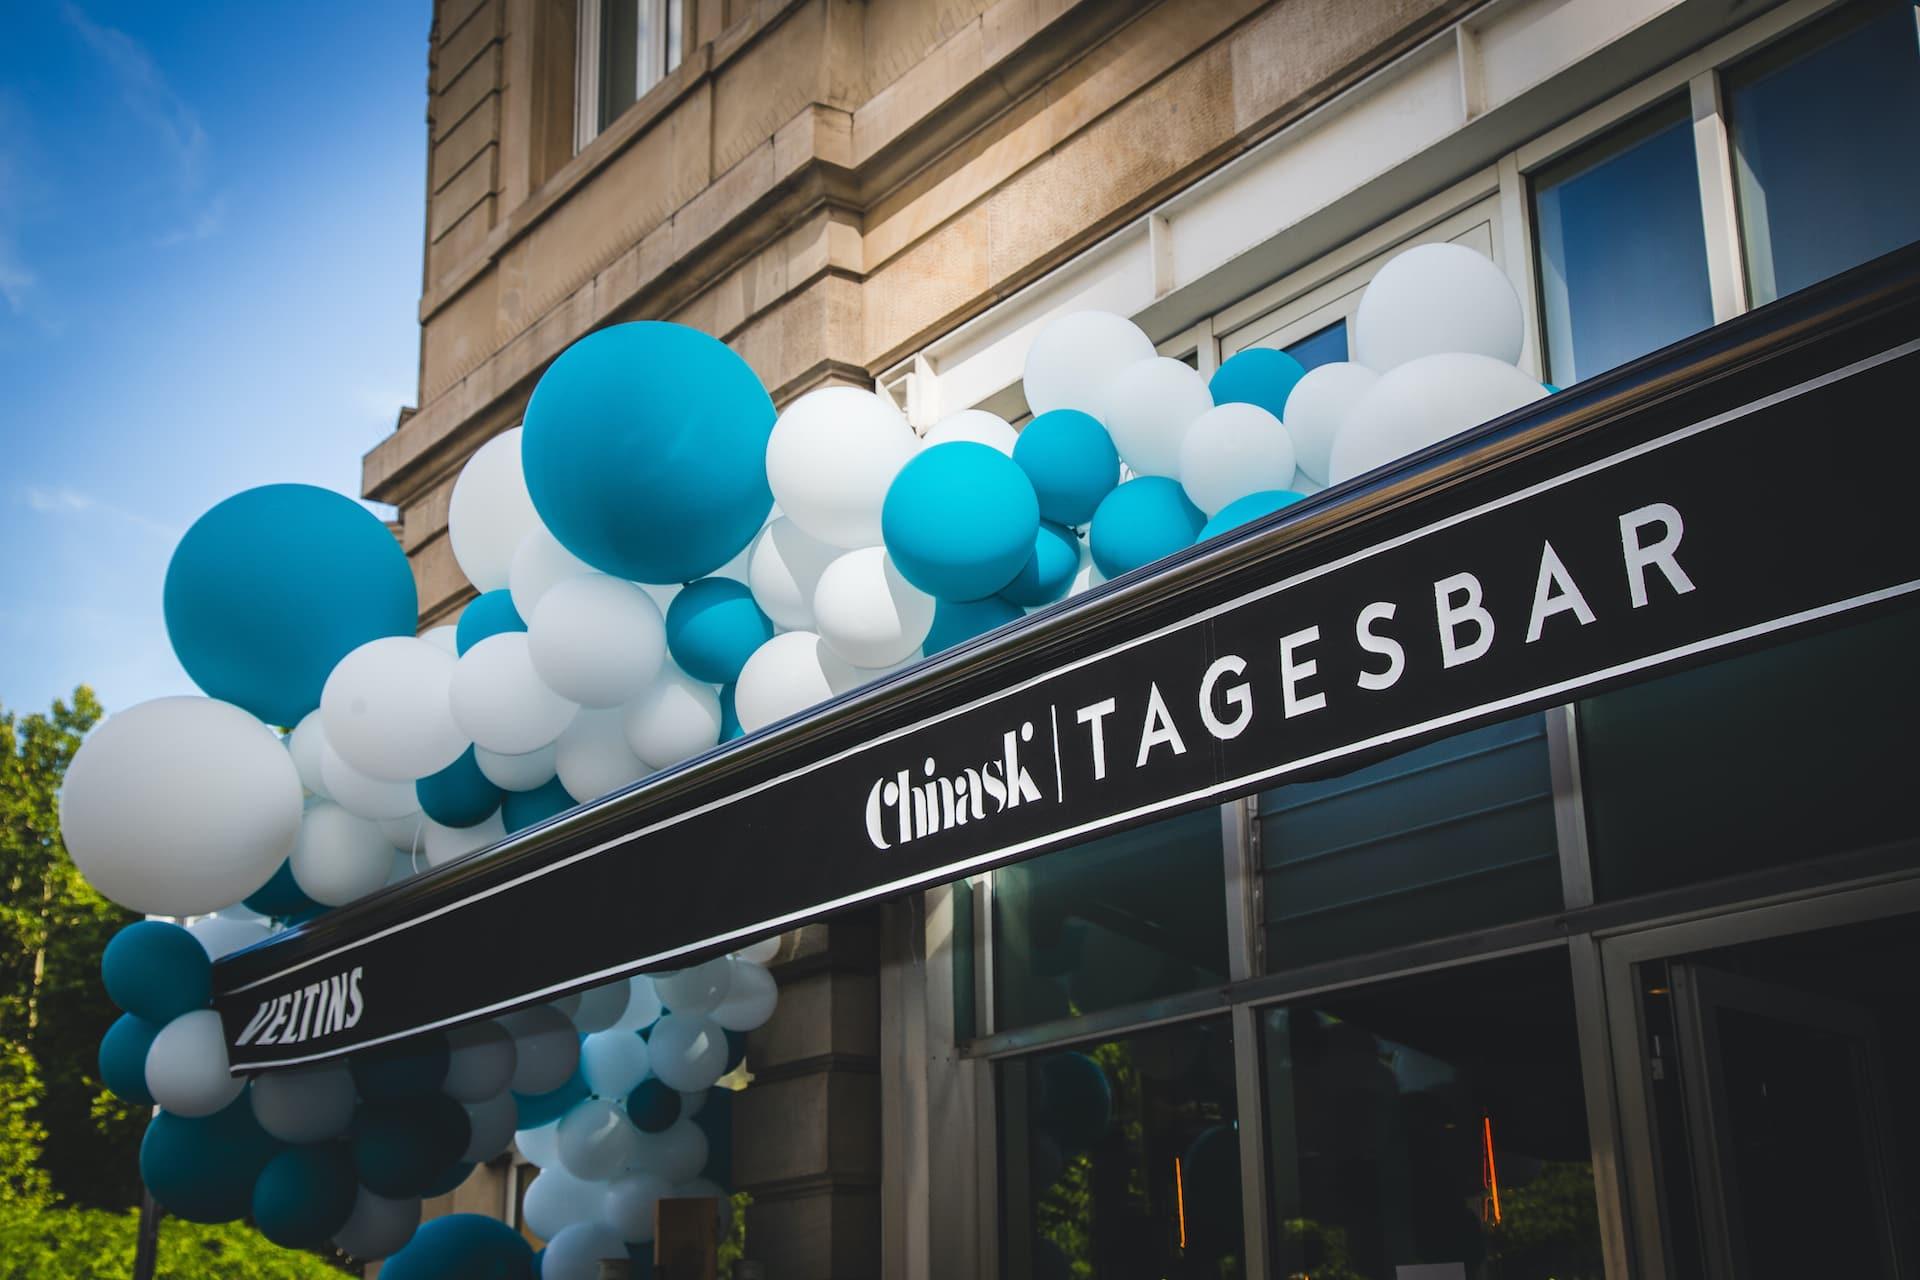 Chinaski_Tagesbar_Ballons Terrasse